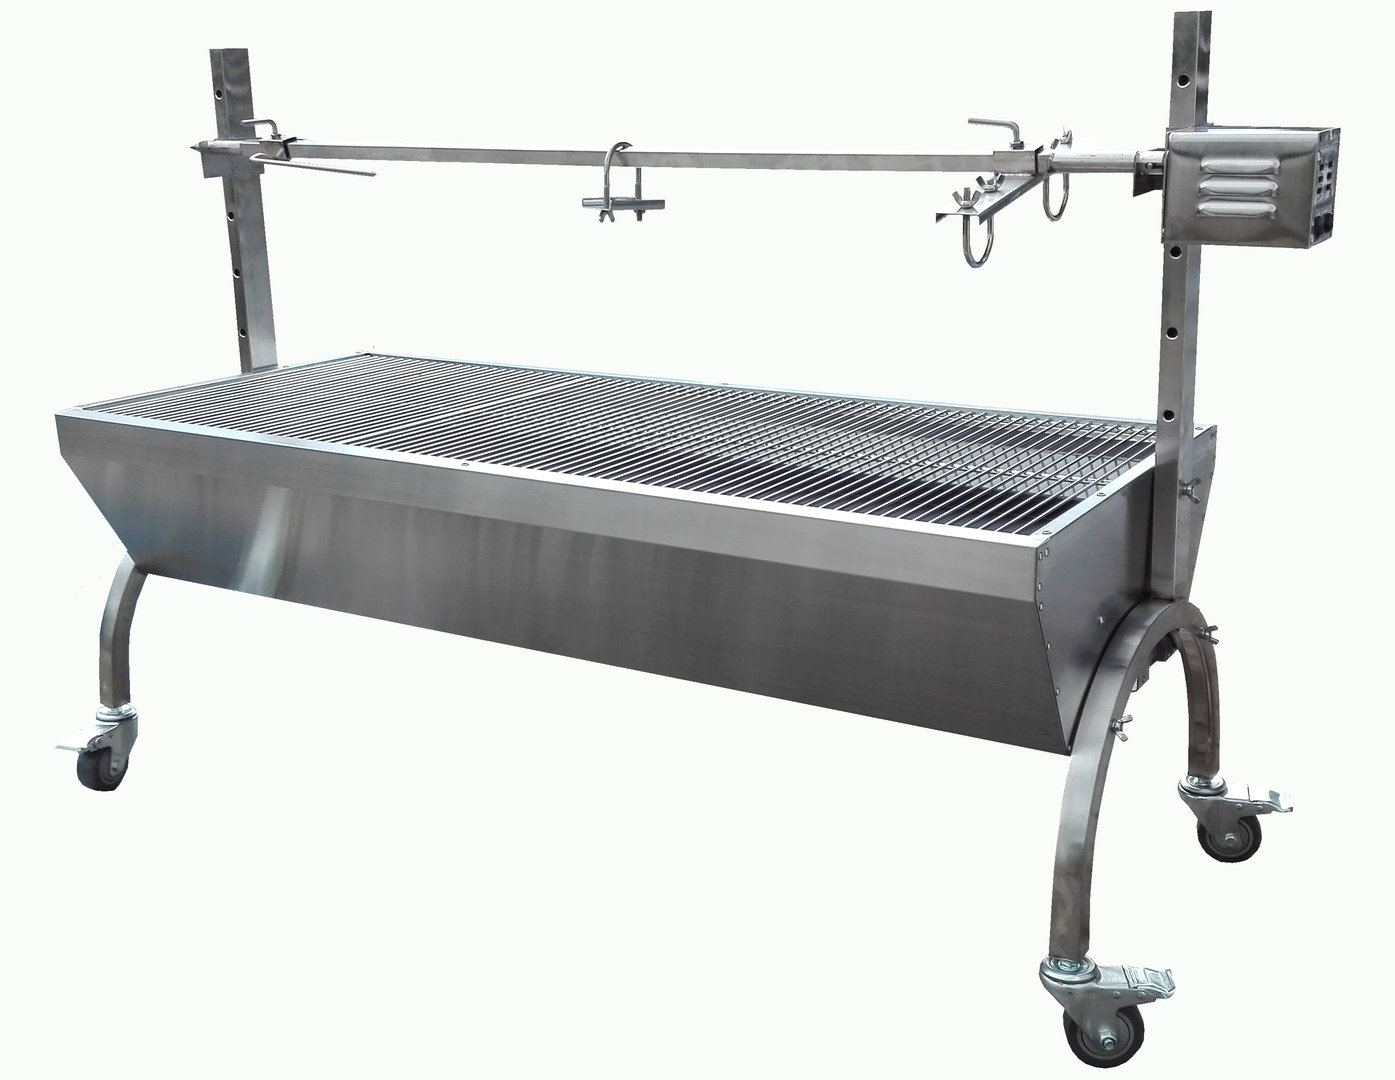 barbecue grill pro inox 2 broche 40 kg m choui francky shop com. Black Bedroom Furniture Sets. Home Design Ideas